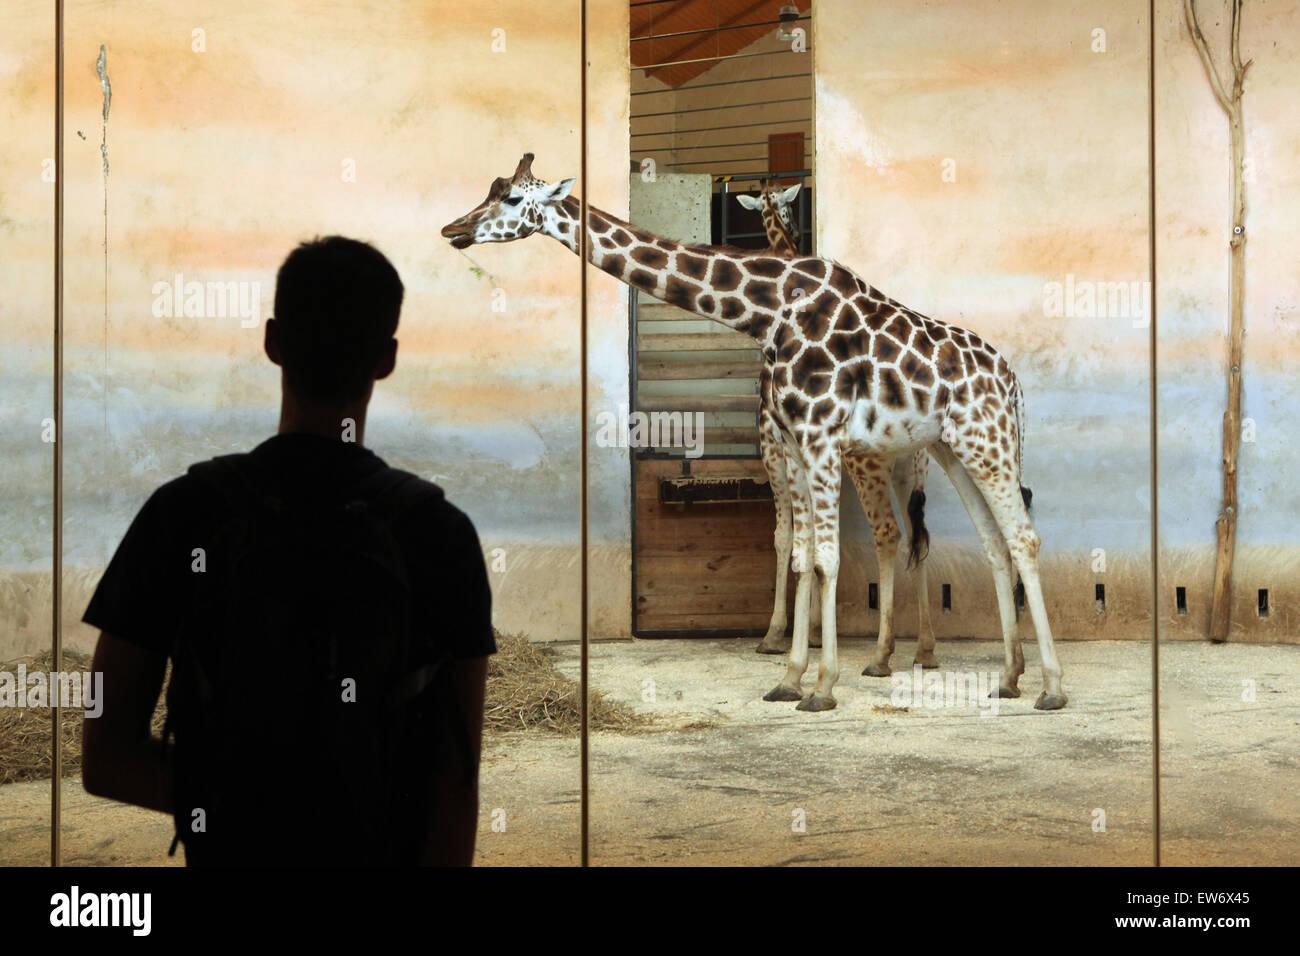 Visiteur regarde les Rothschild Girafe (Giraffa camelopardalis rothschildi) au Zoo de Prague, République tchèque. Photo Stock